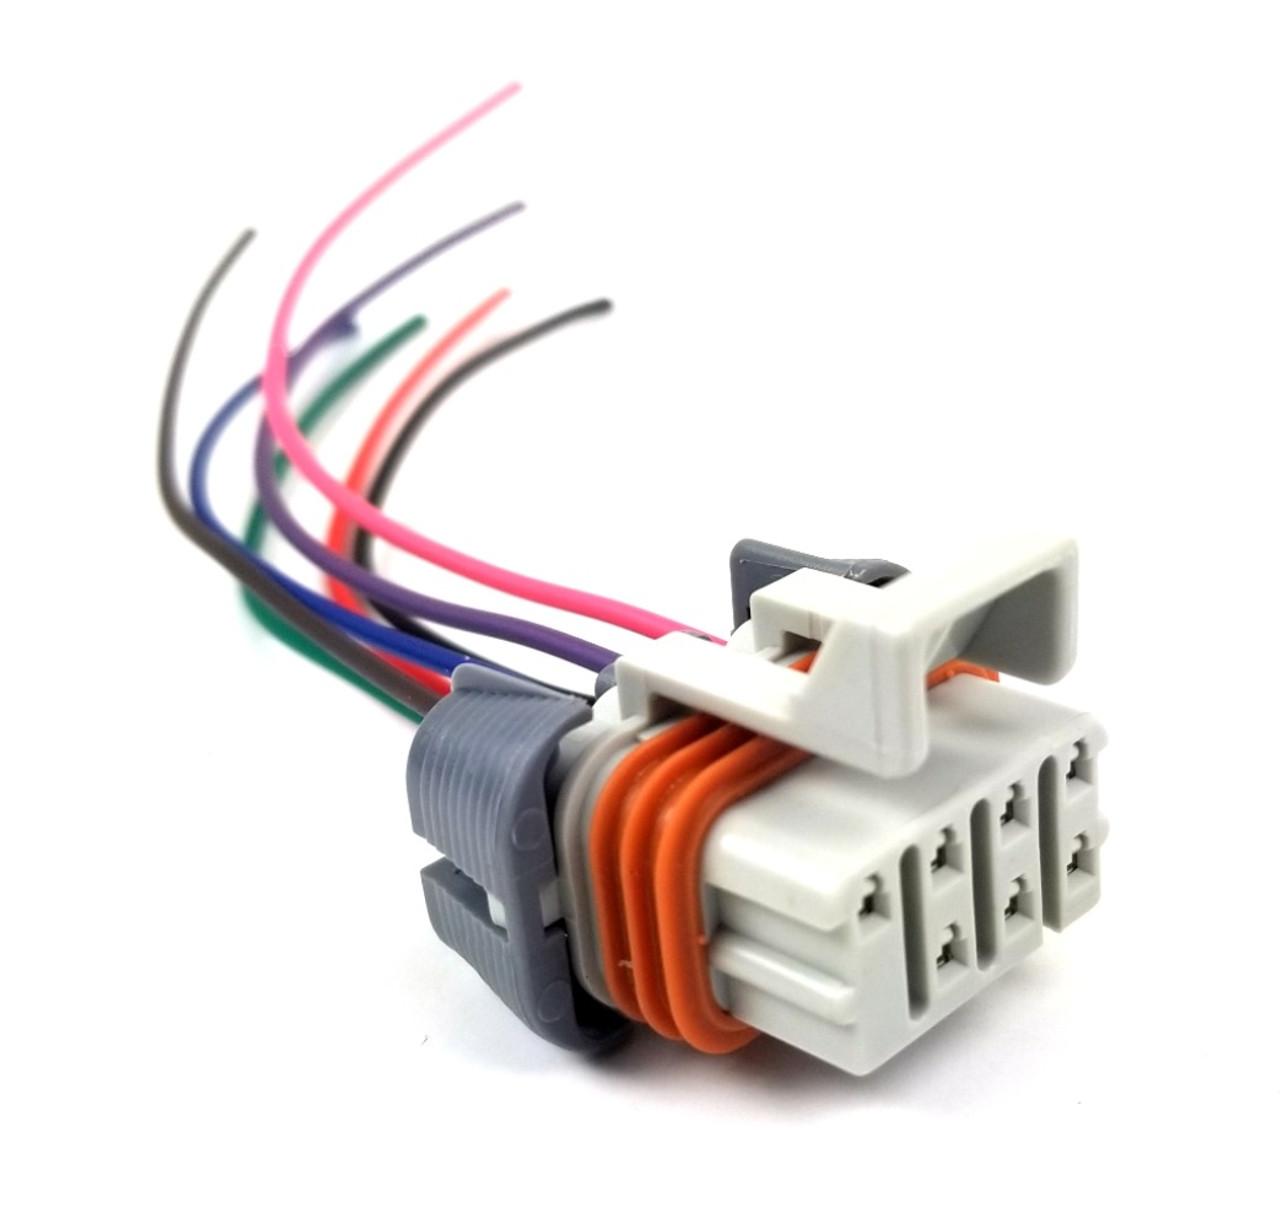 LS1 Ls2 LS3 CPH Sub Connector   Wiring SpecialtiesWiring Specialties